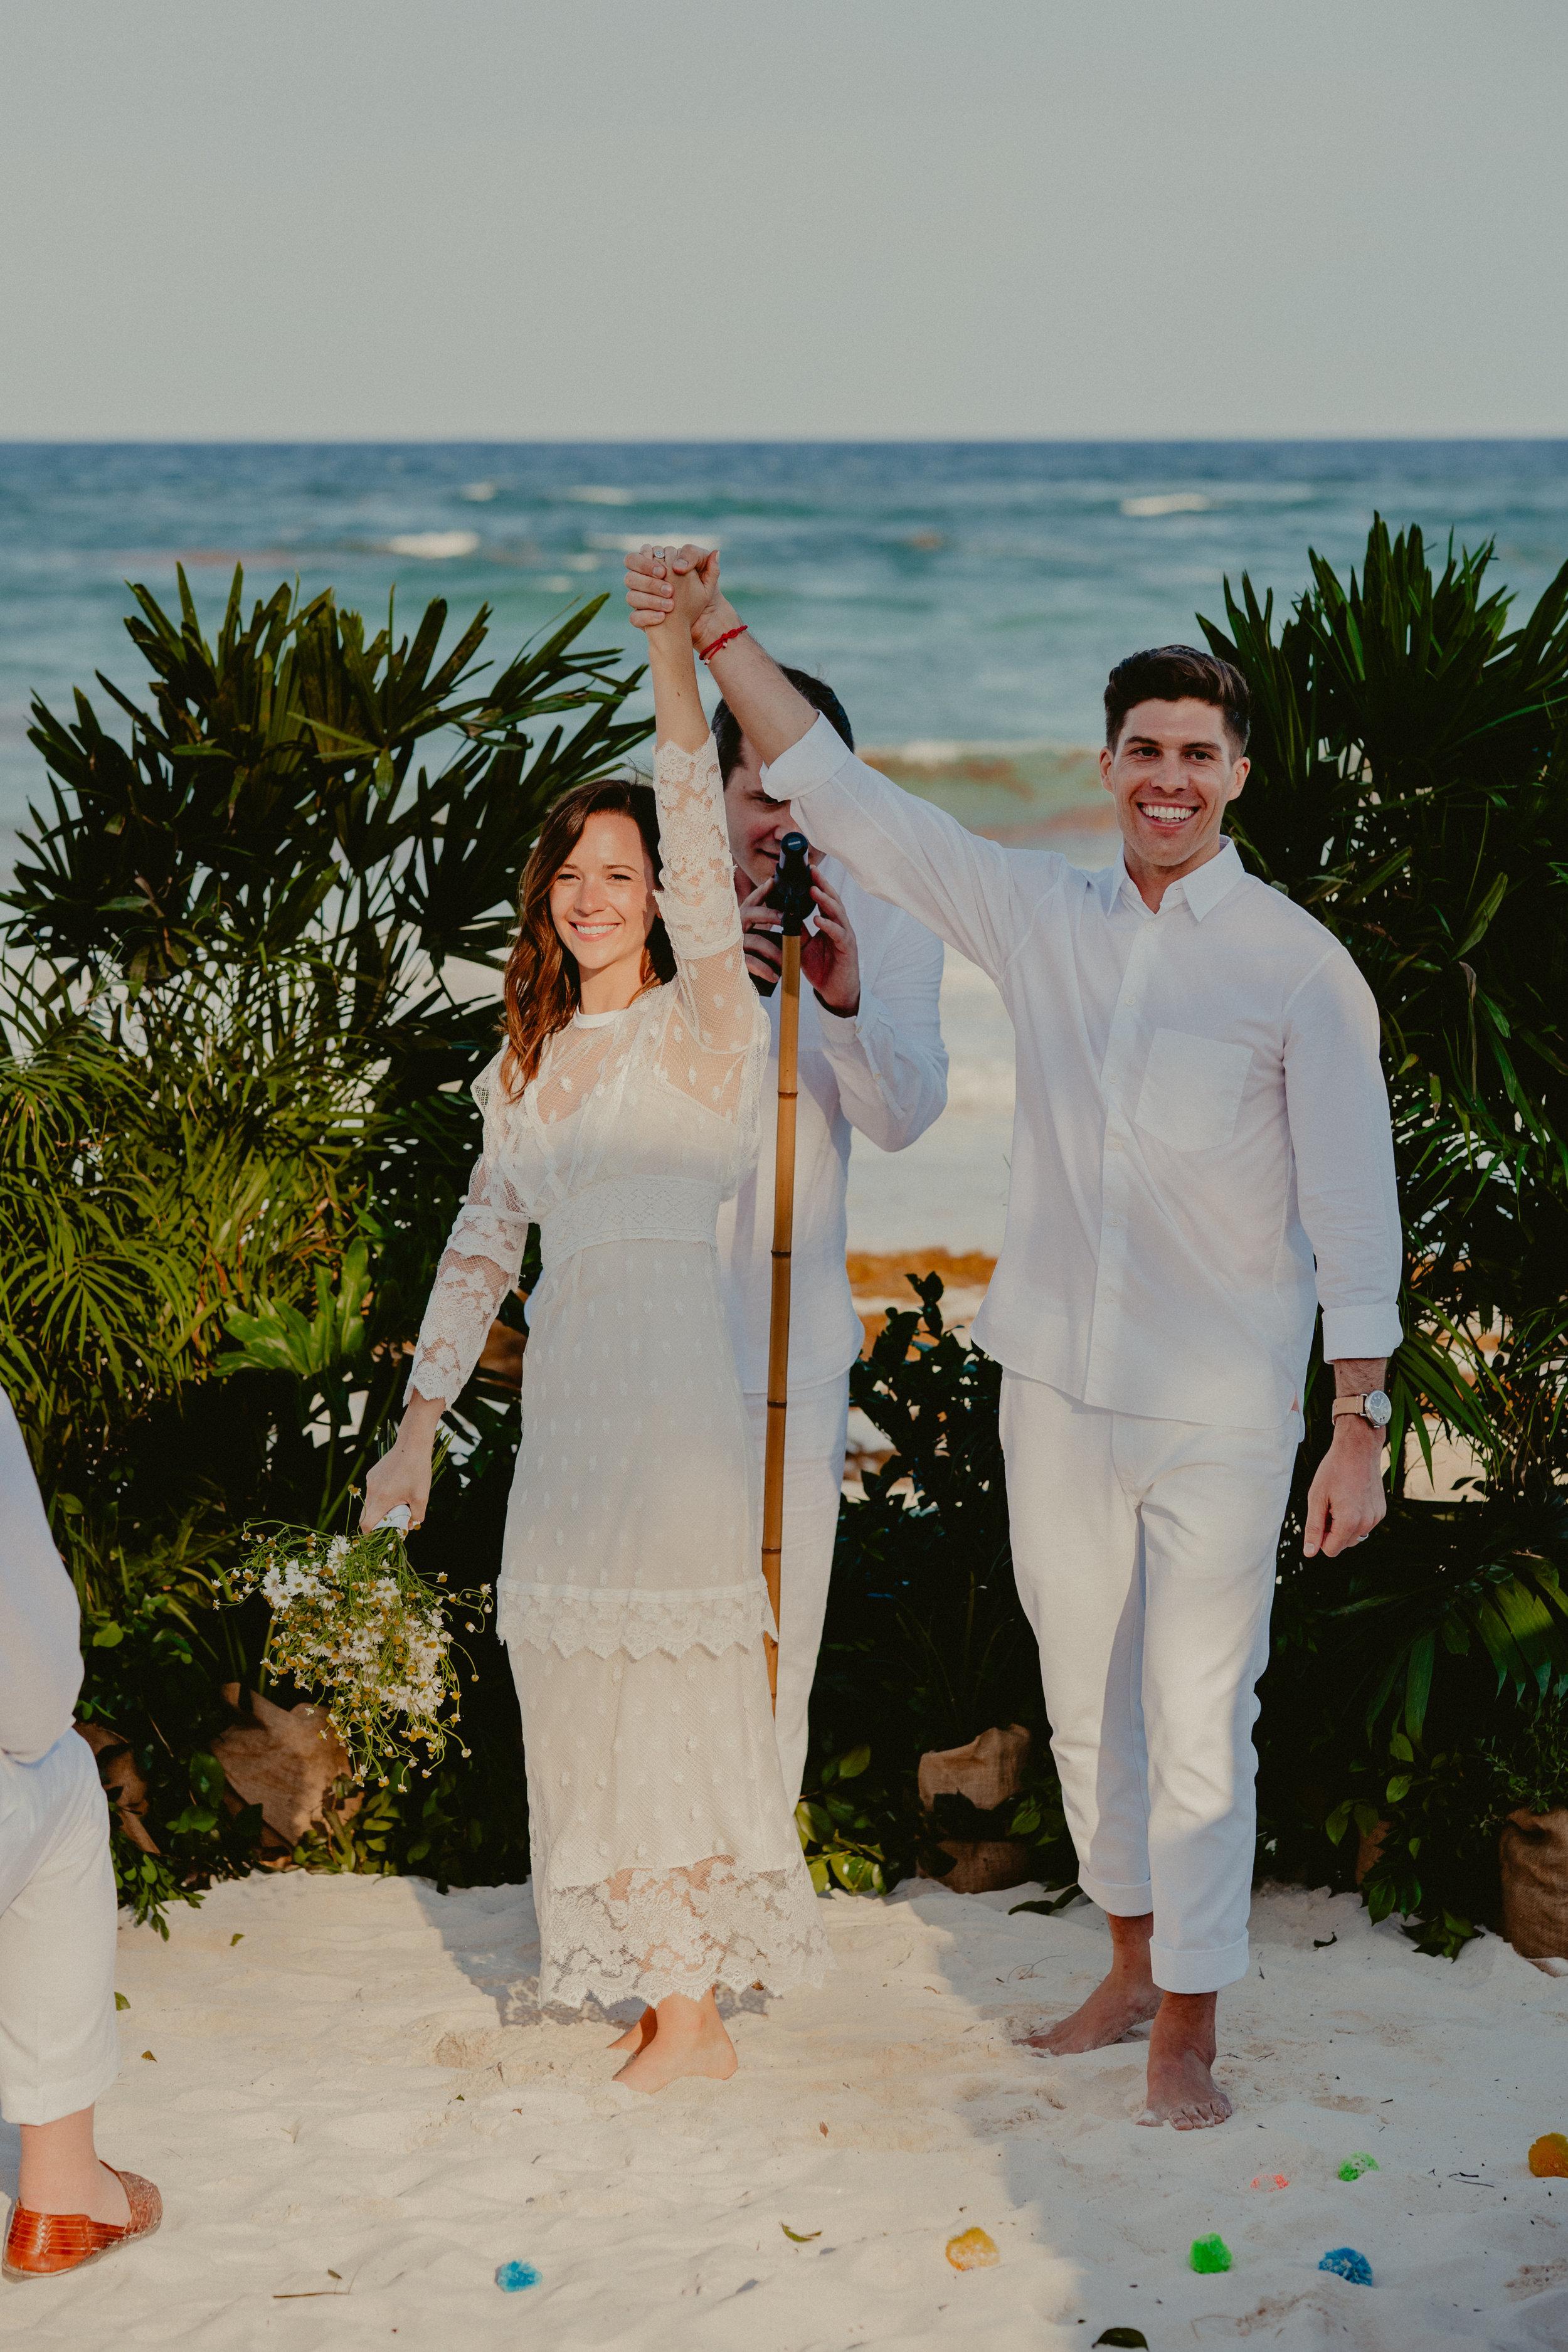 Joanna-and-Cameron_Ahua_Tulum_Wedding_Chellise_MIchael-Photography-314.jpg